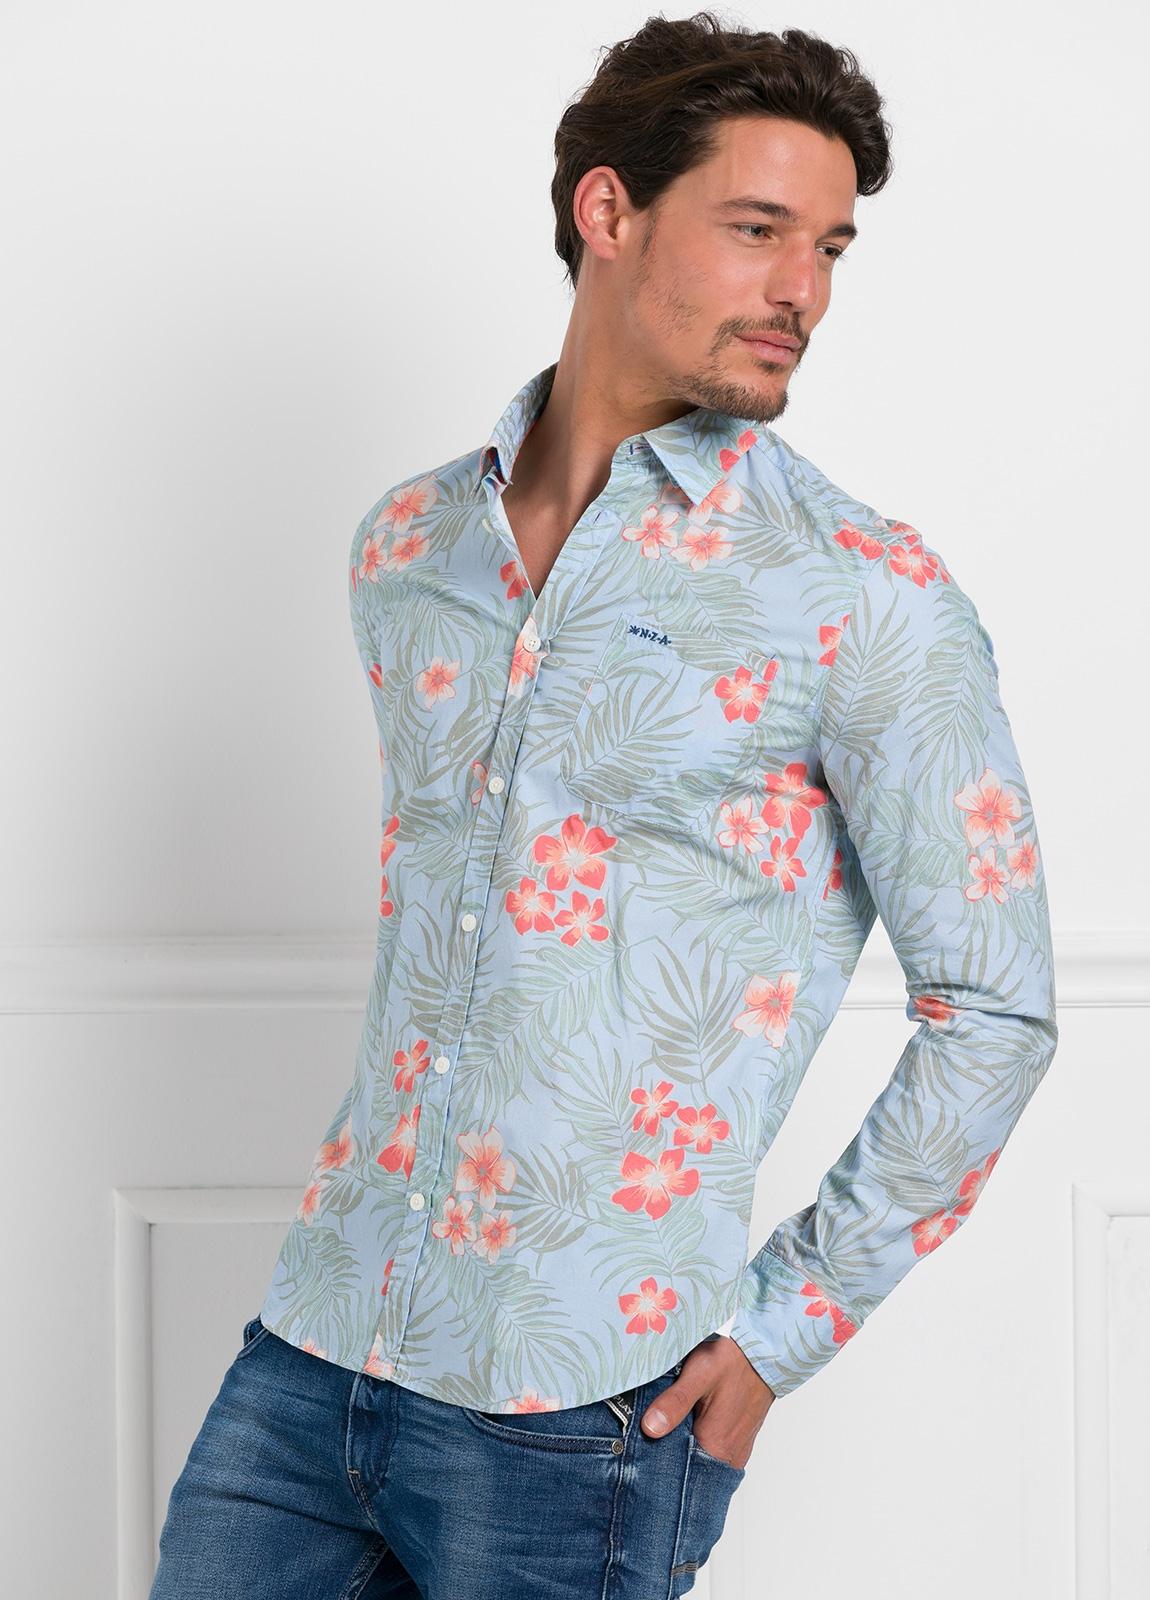 Camisa Sport dibujo flores color azul, 100% Algodón.